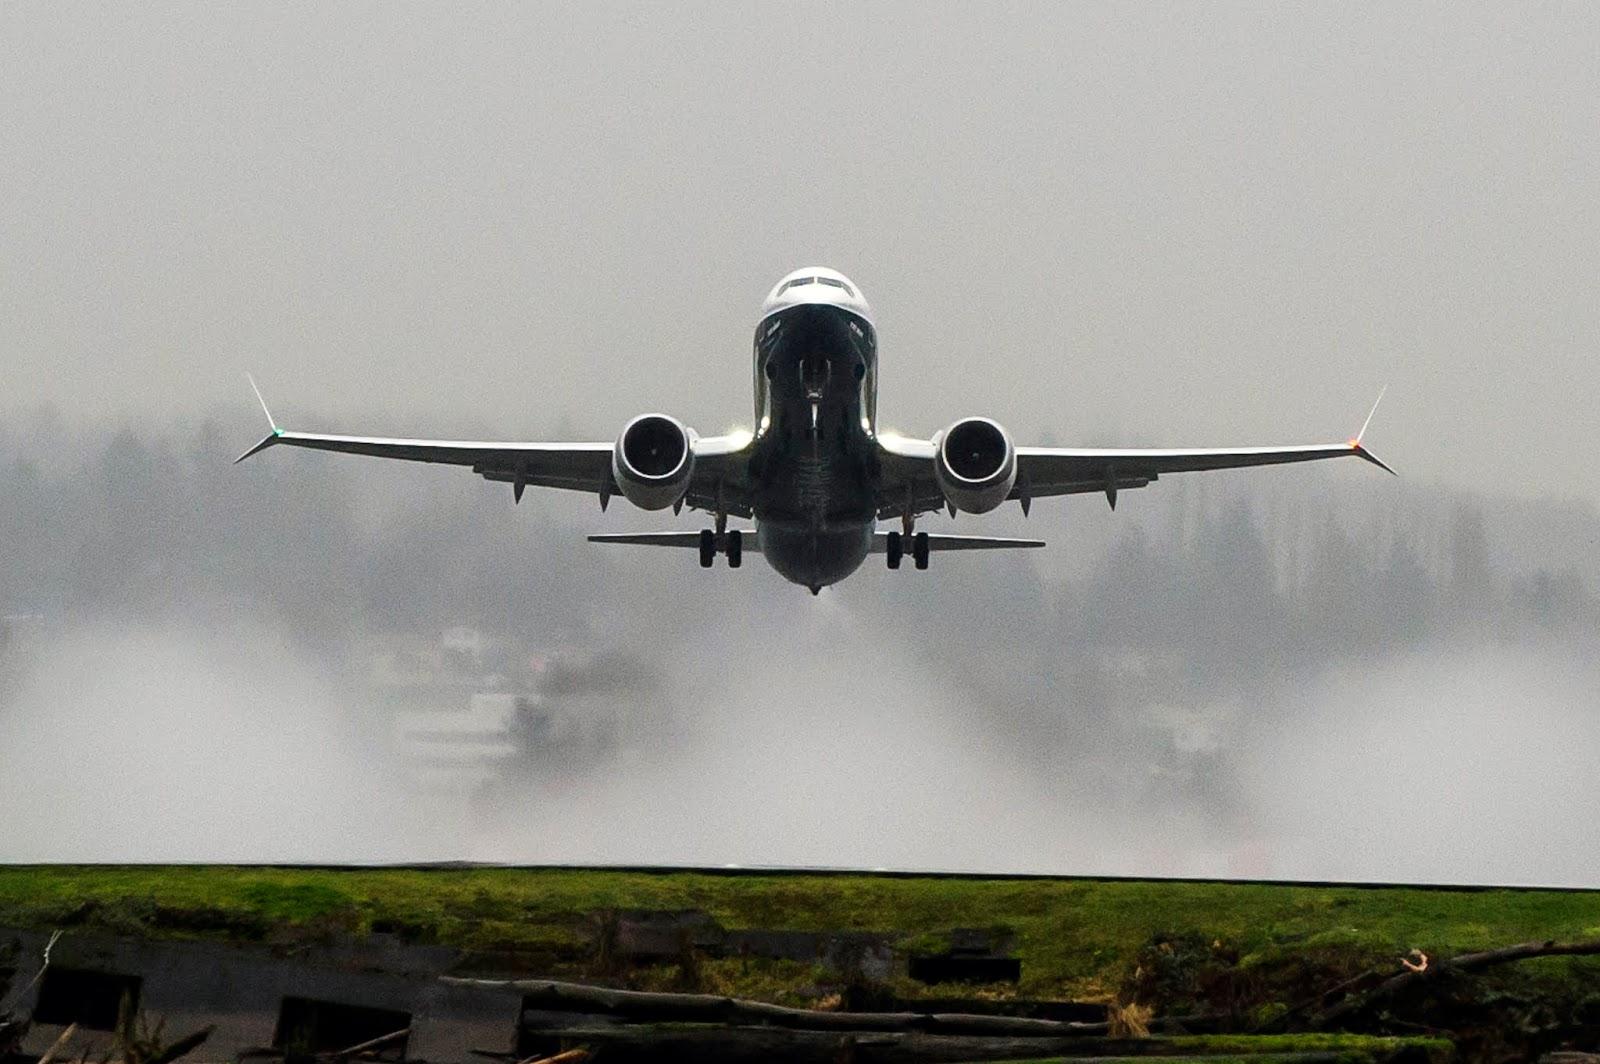 Boeing publica boletín de servicio para Slats Tracks de